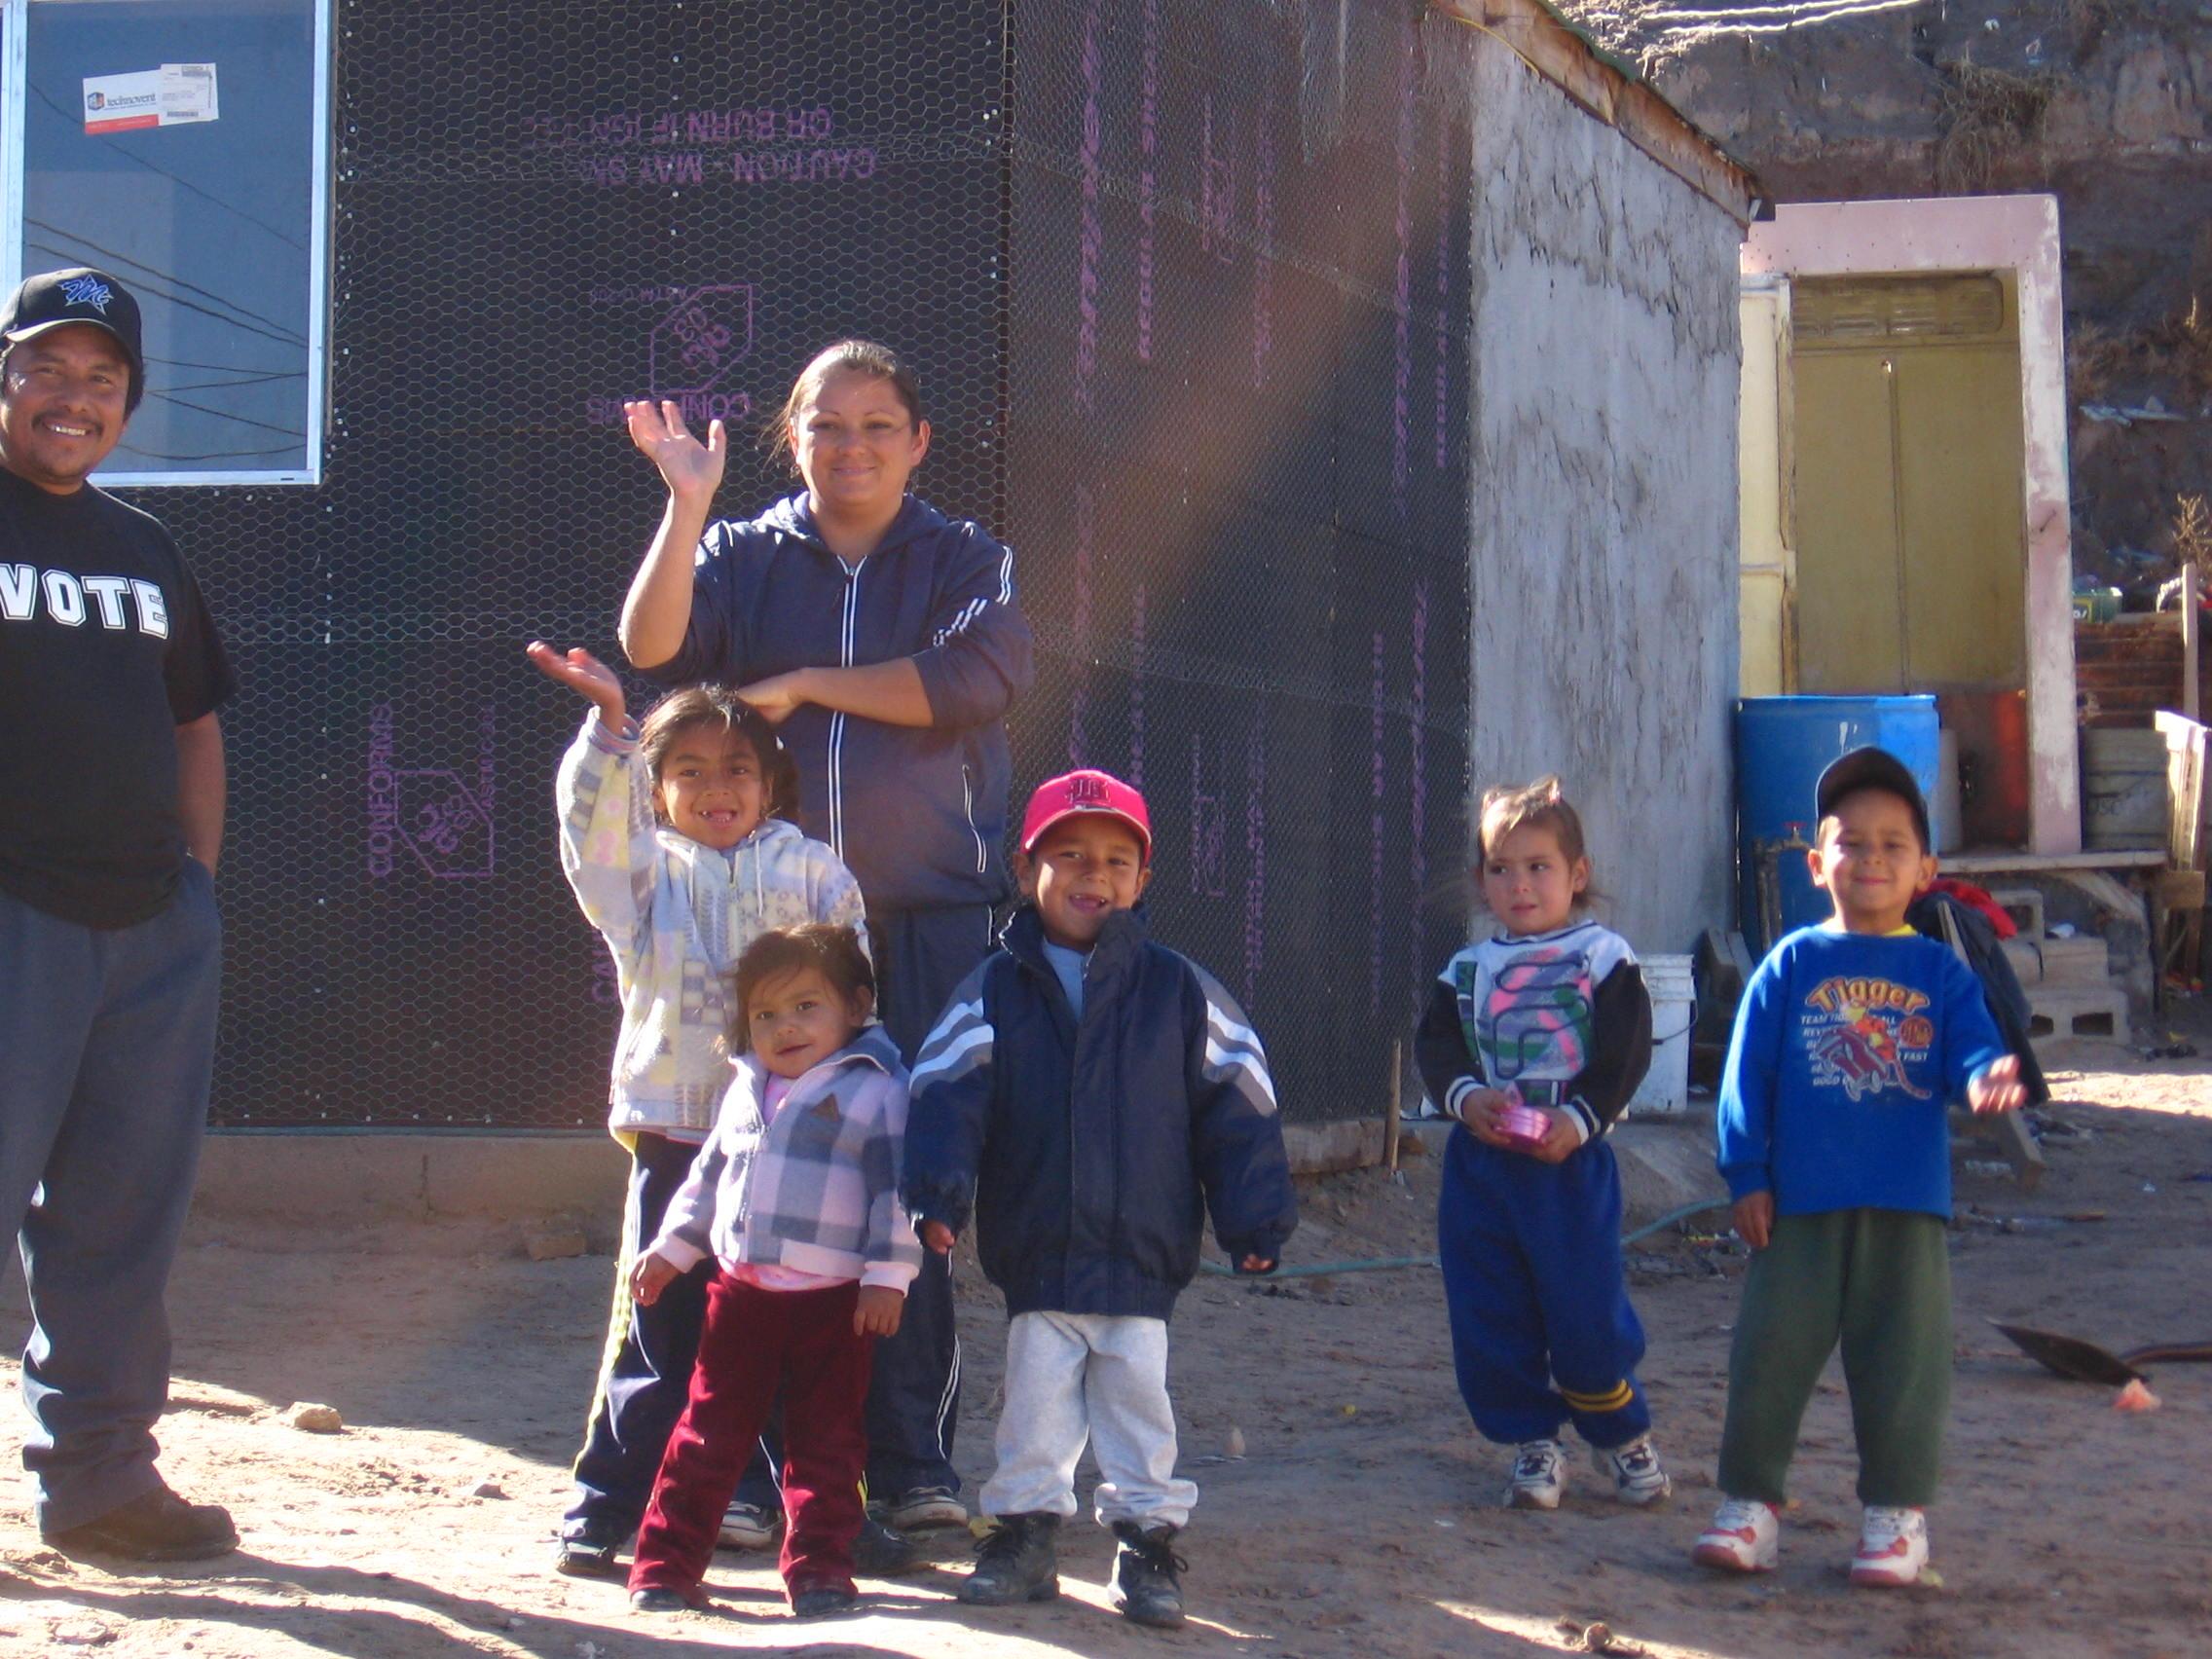 A family in the Anapra neighbourhood of Juarez, Mexico